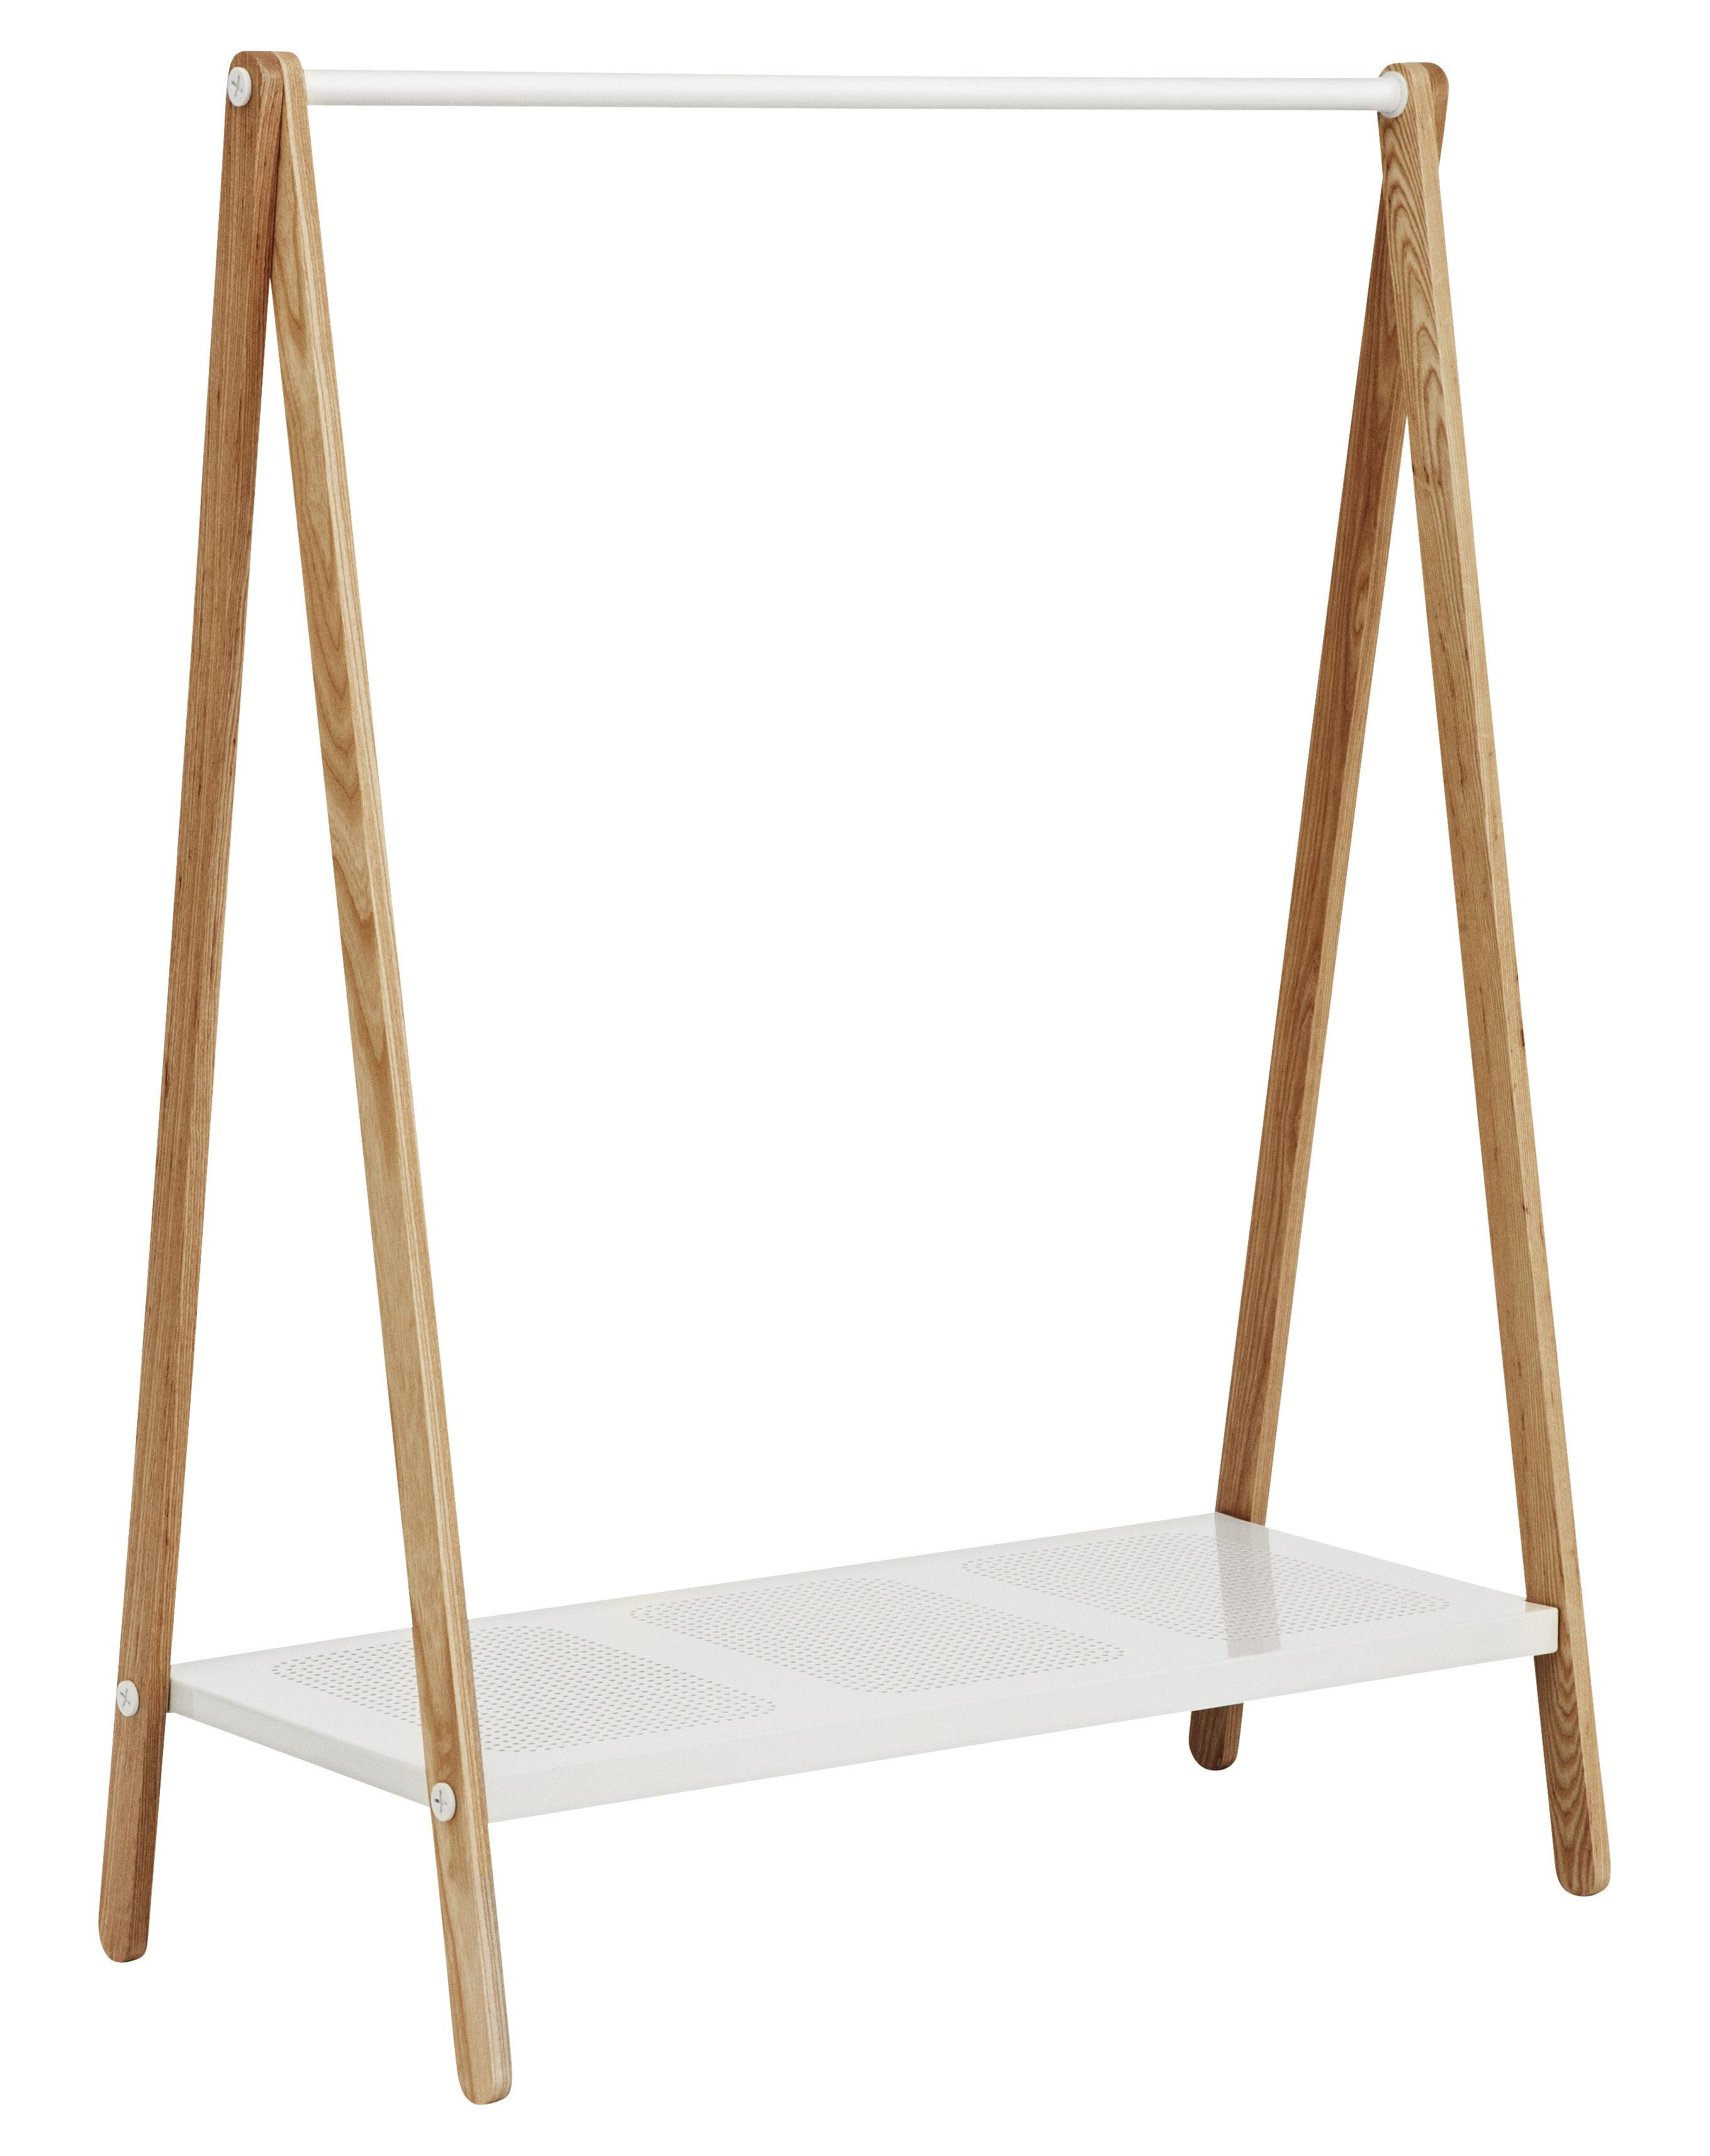 Furniture - Coat Racks & Pegs - Toj Rack - Large by Normann Copenhagen - W 120 cm - White - Ashwood, Metal